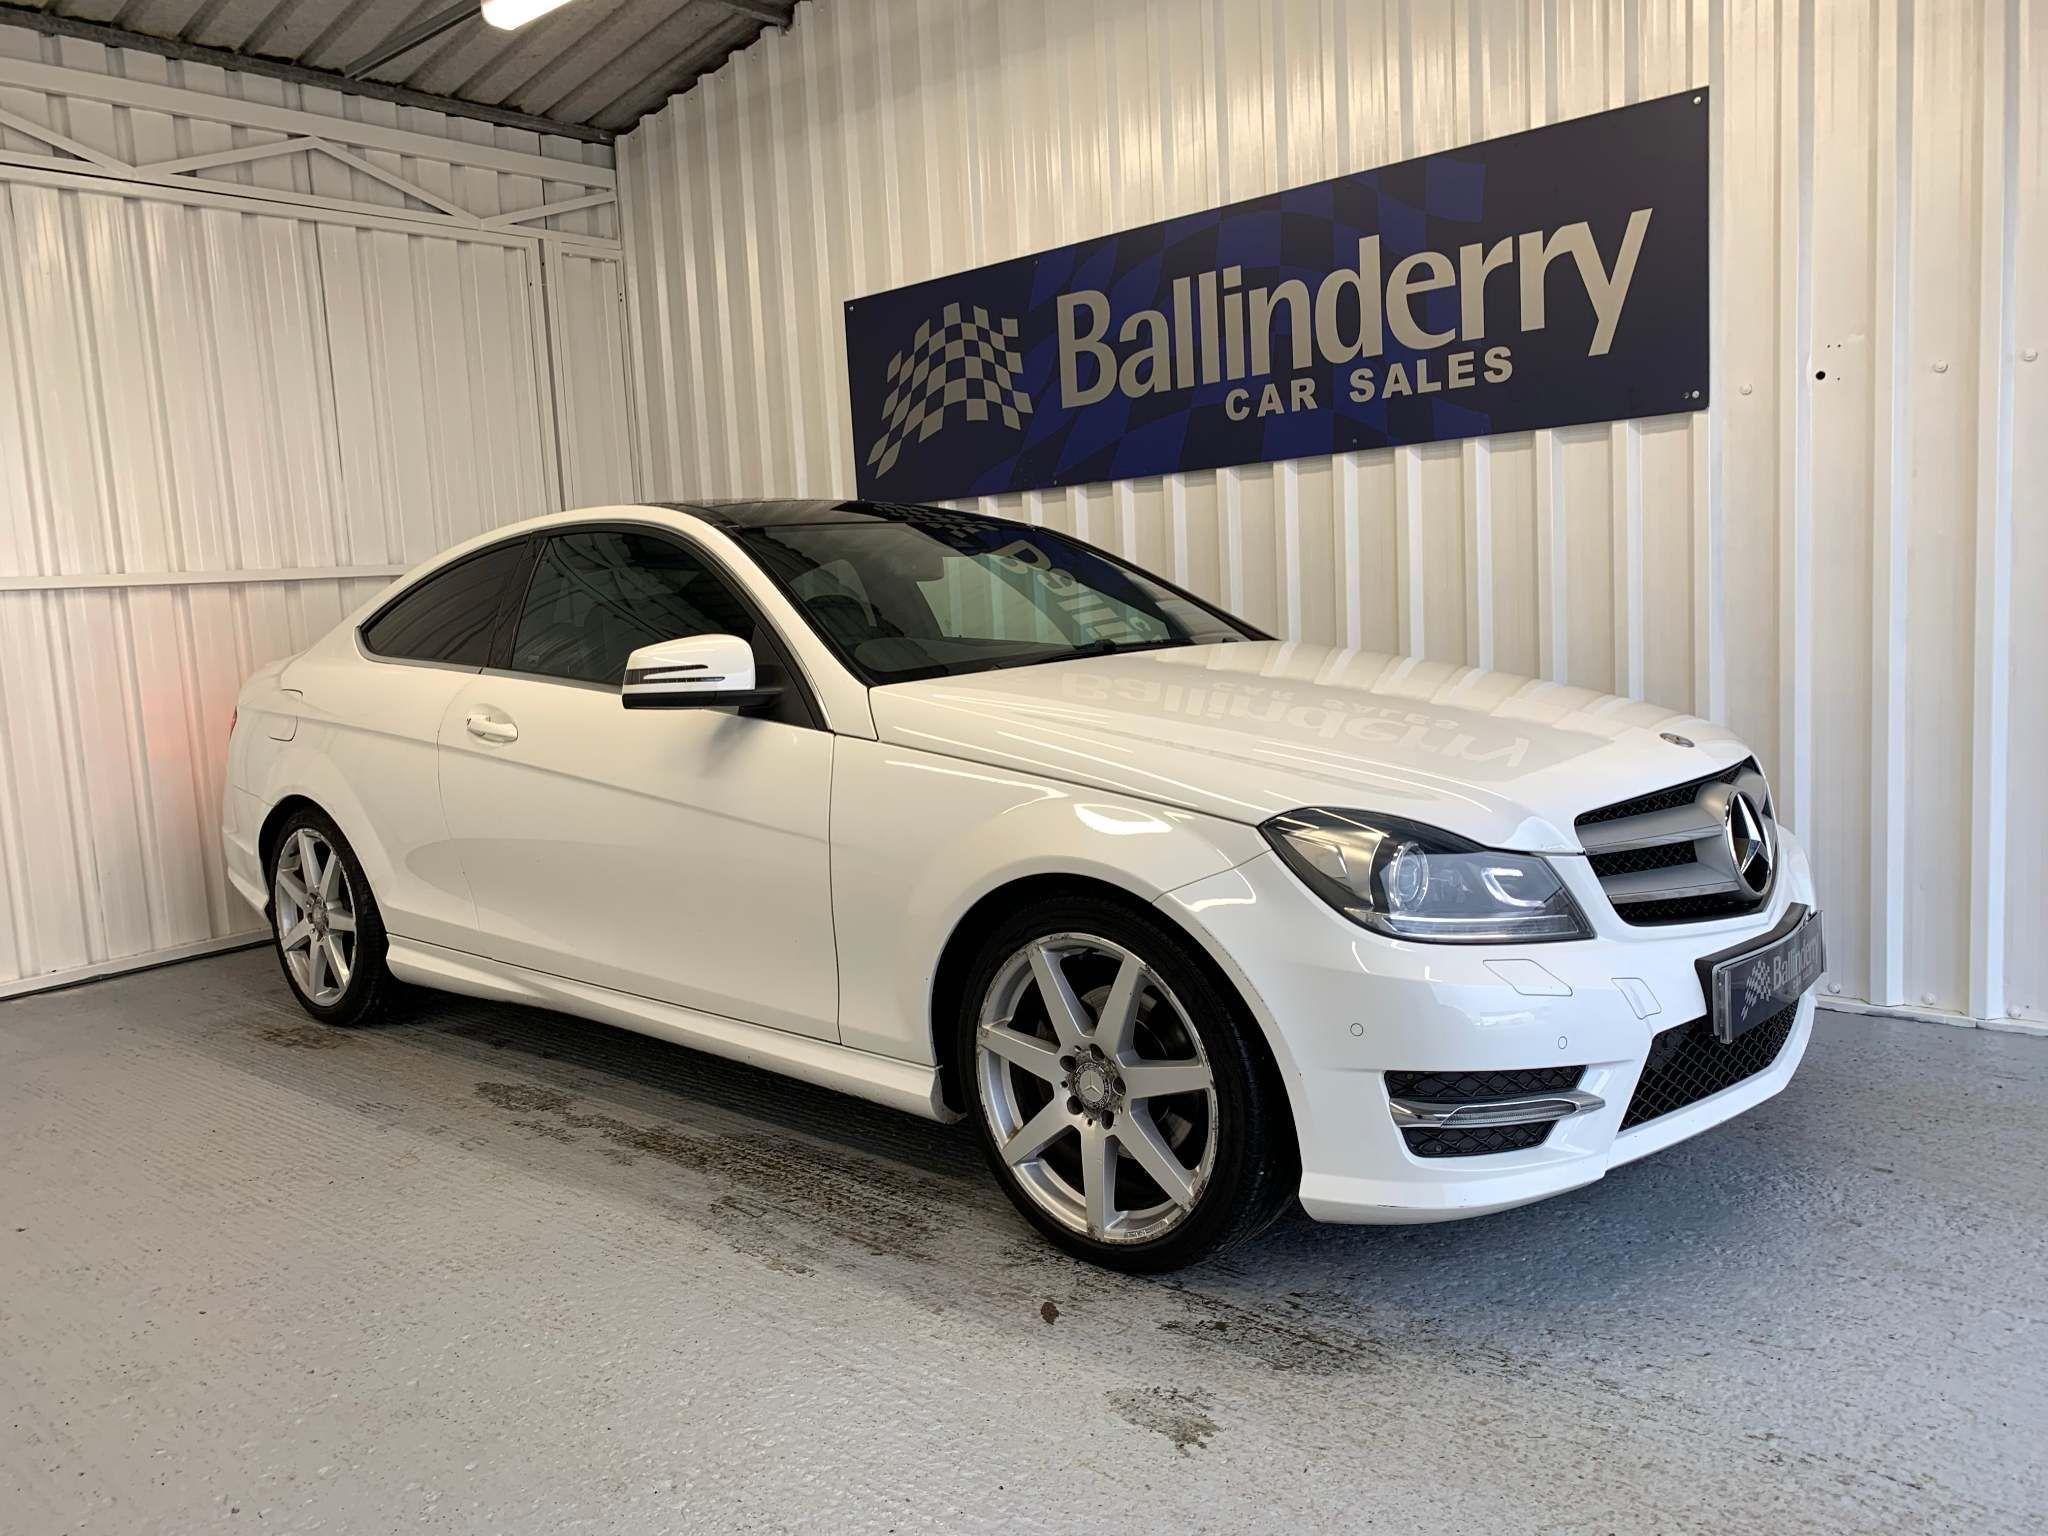 2014 MERCEDES BENZ C Class 2.1 C220 CDI AMG Sport Edition (Premium Plus) 7G-Tronic Plus Diesel Automatic GLASS ROOF-SAT NAV-REVERSE CAM – Ballinderry Car Sales Moira